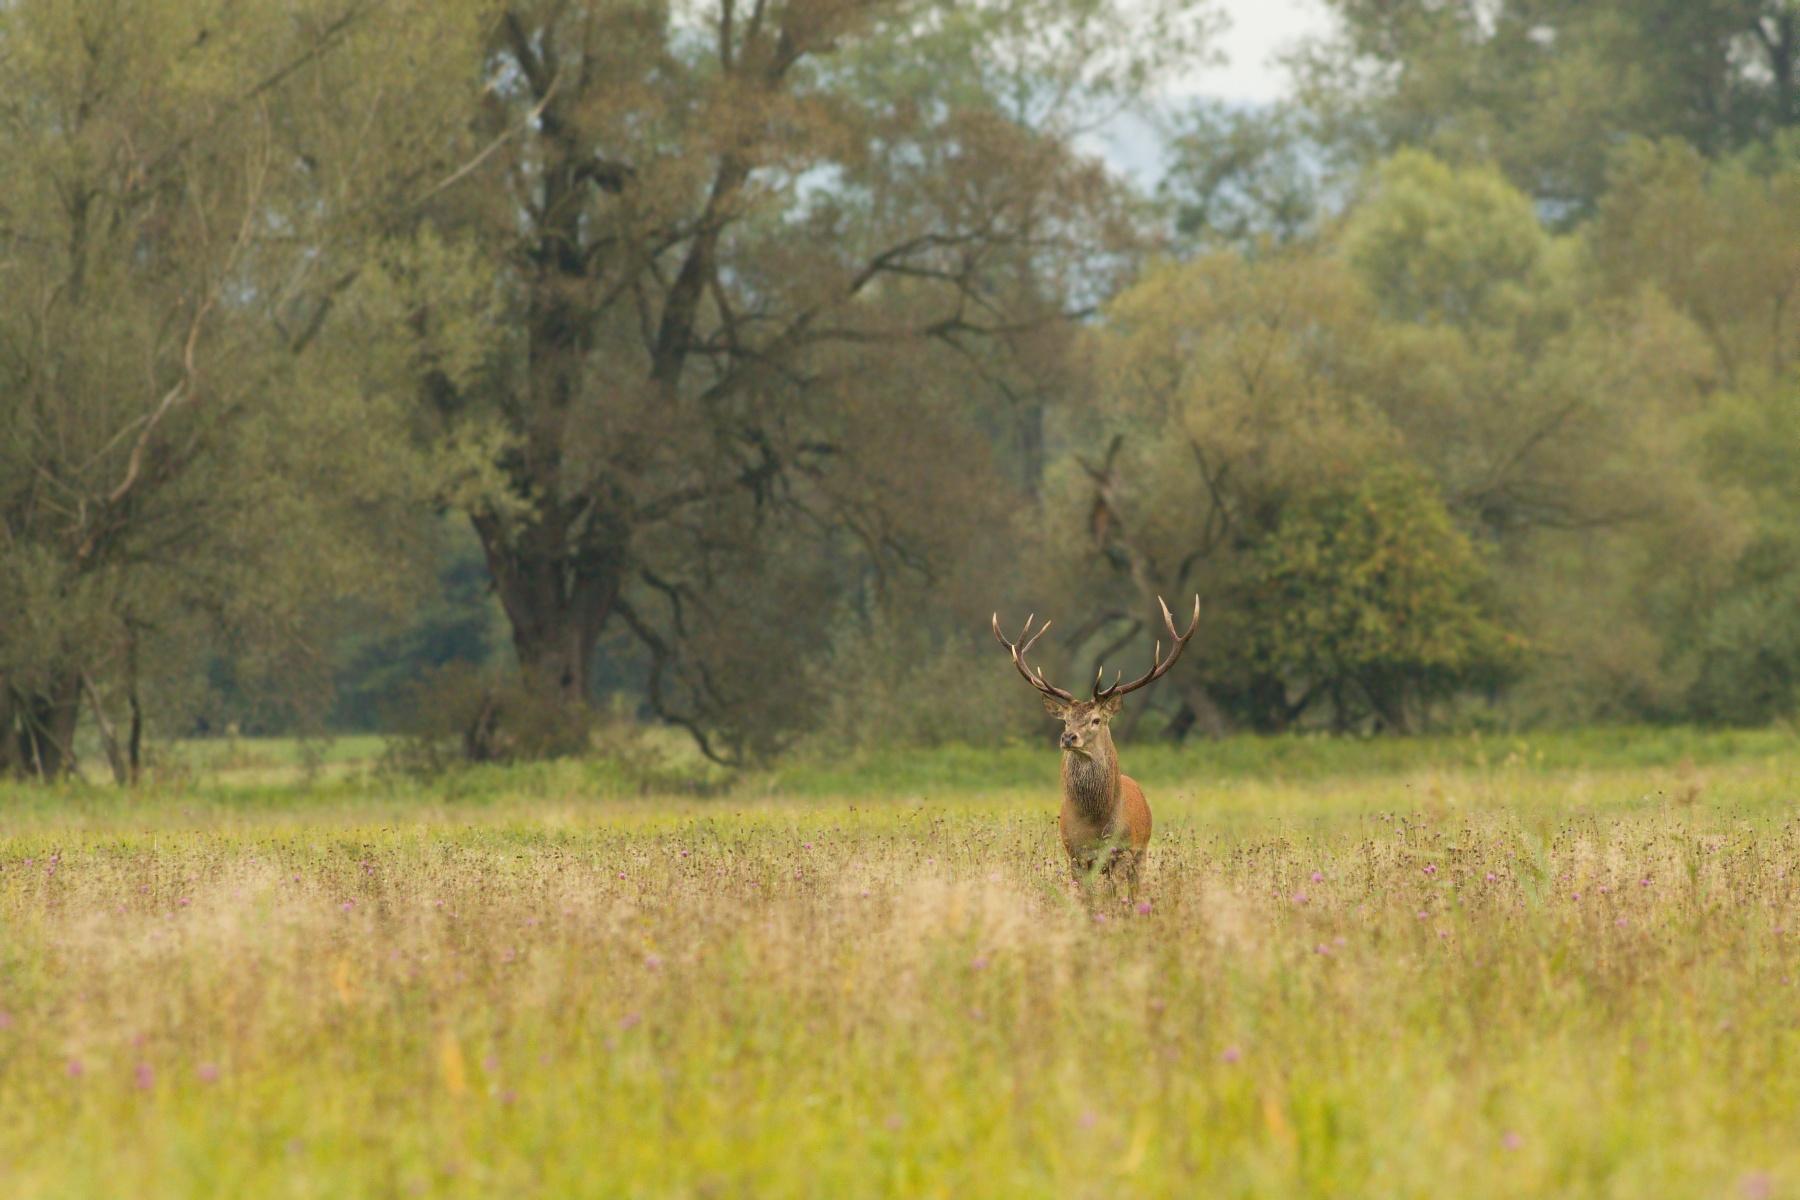 jeleň lesný (Cervus elaphus) Red deer, NPR Kláštorské lúky, Turčianska kotlina, Slovensko Canon EOS 7D mark II, Canon 300 mm f2.8 L IS USM, f4.5, 1/800, ISO 1600, 22. september 2017